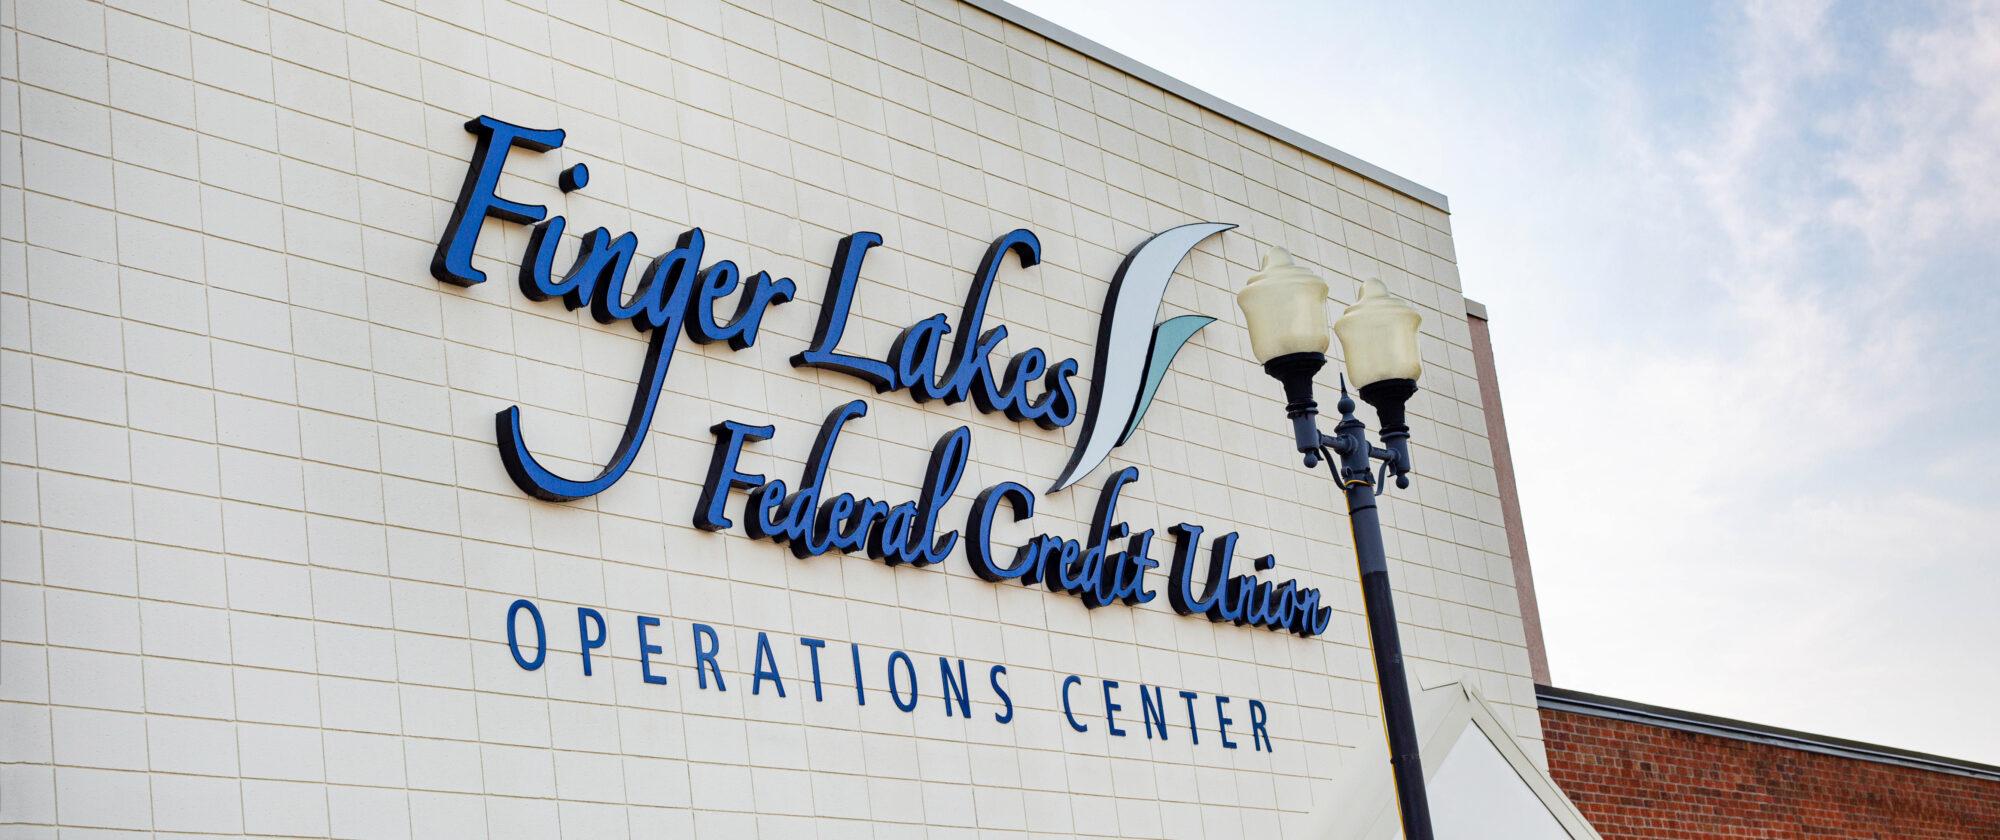 Finger Lakes Federal Credit Union Sign Brand Inhouse Design 1